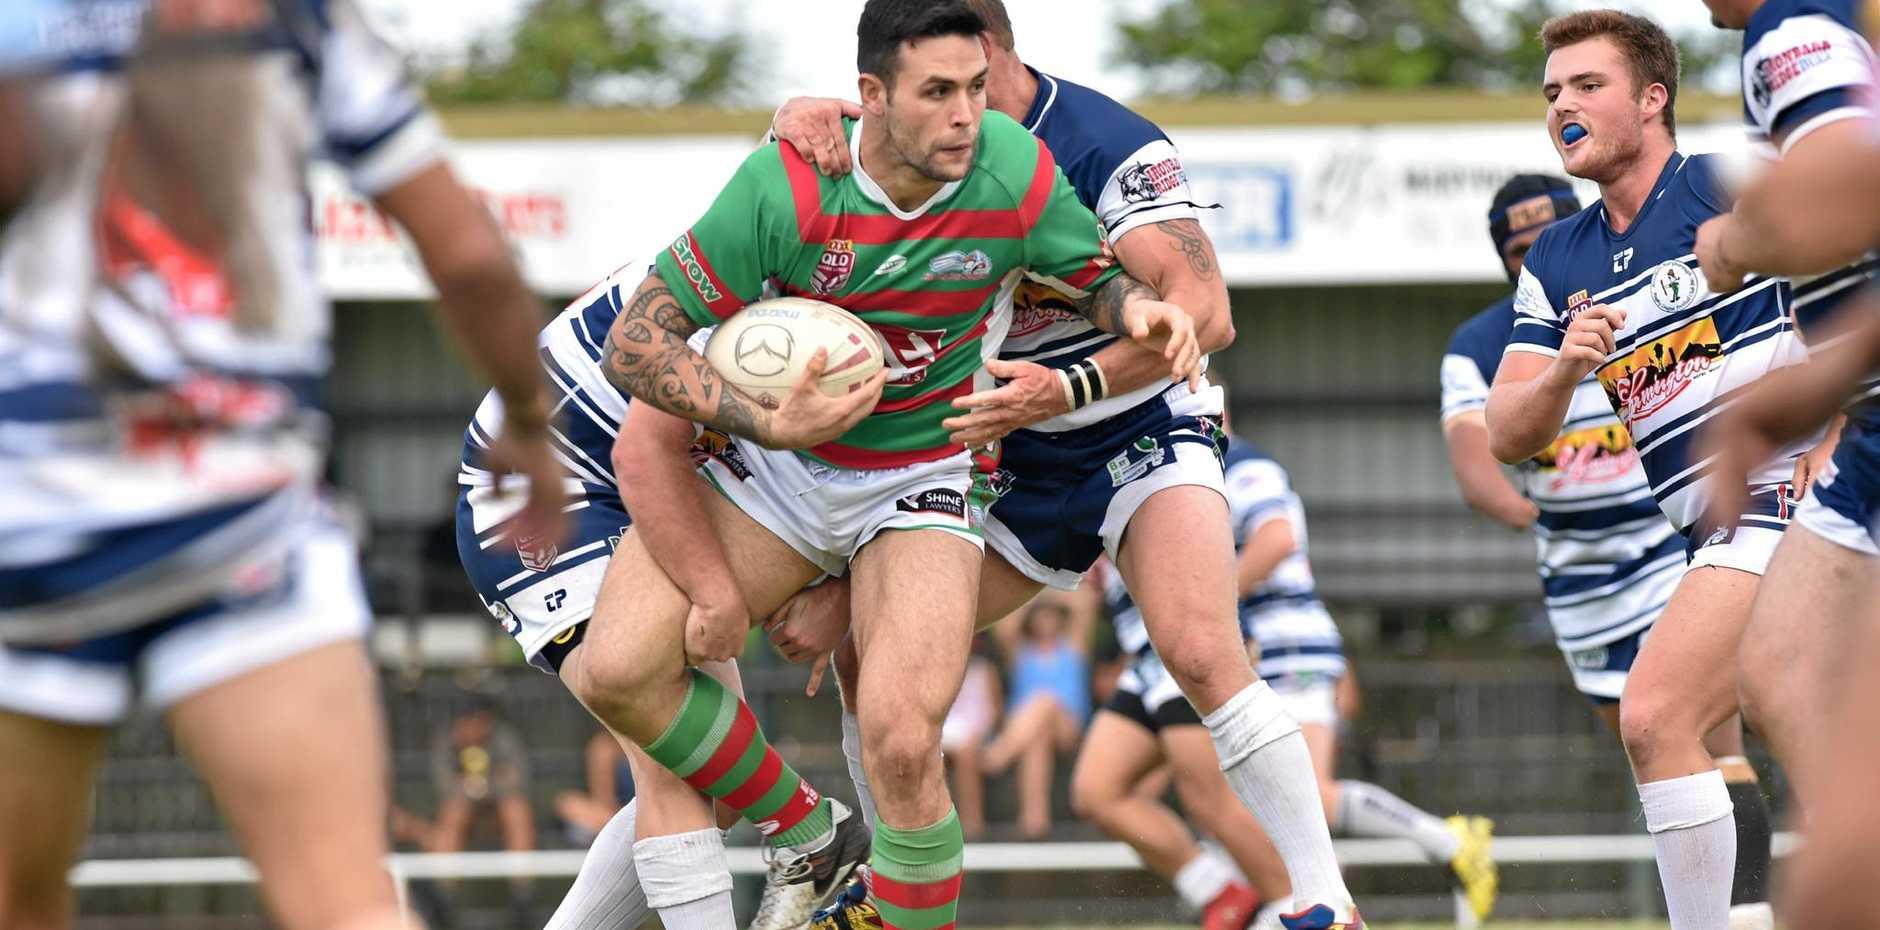 Rugby League - Seagulls V. Brothers. Jai Ingram(Seagulls).